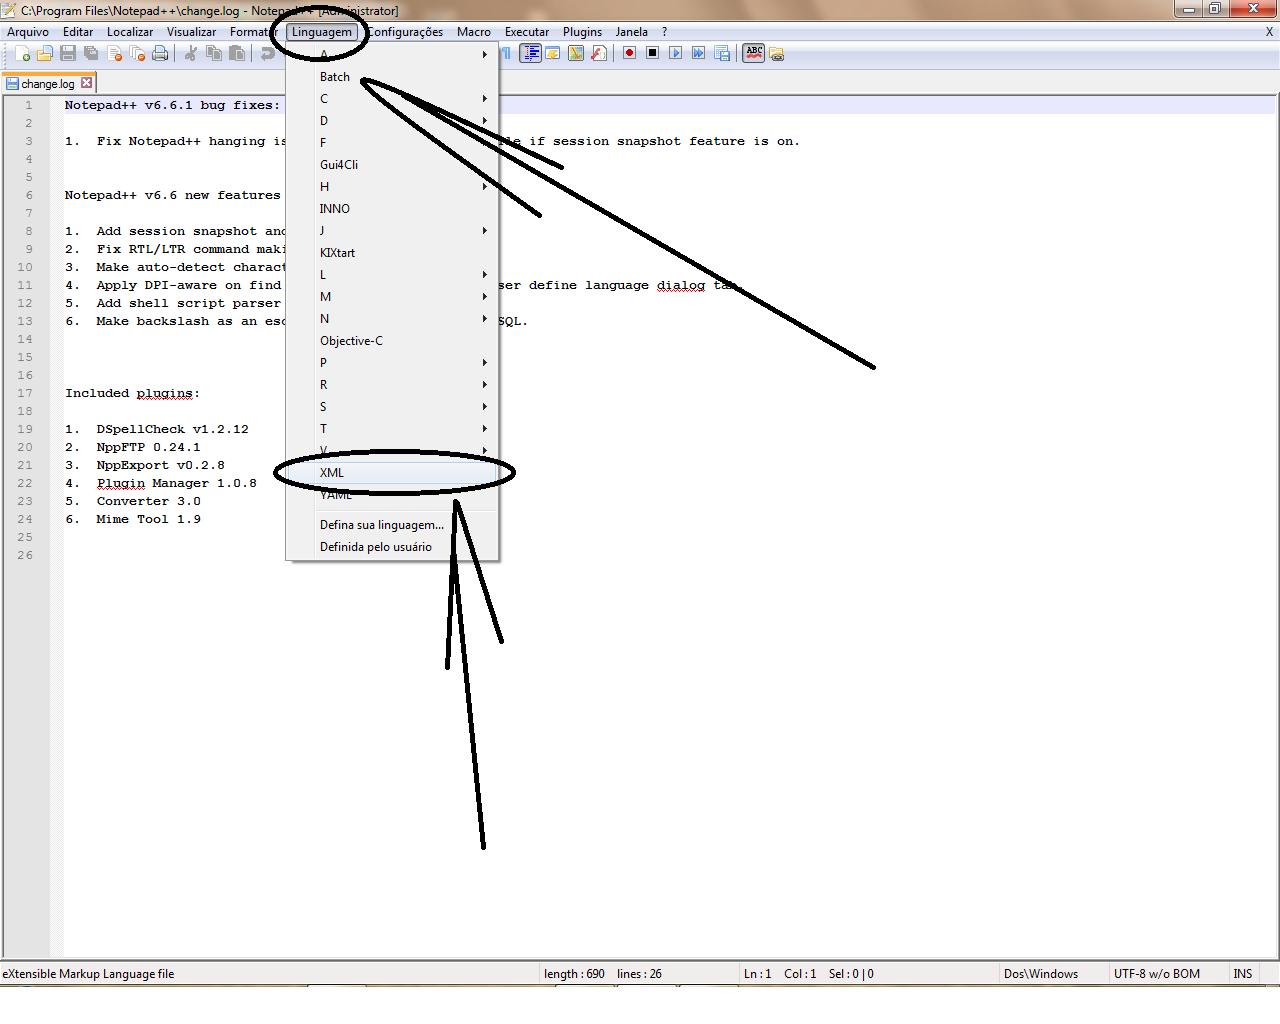 Editar template